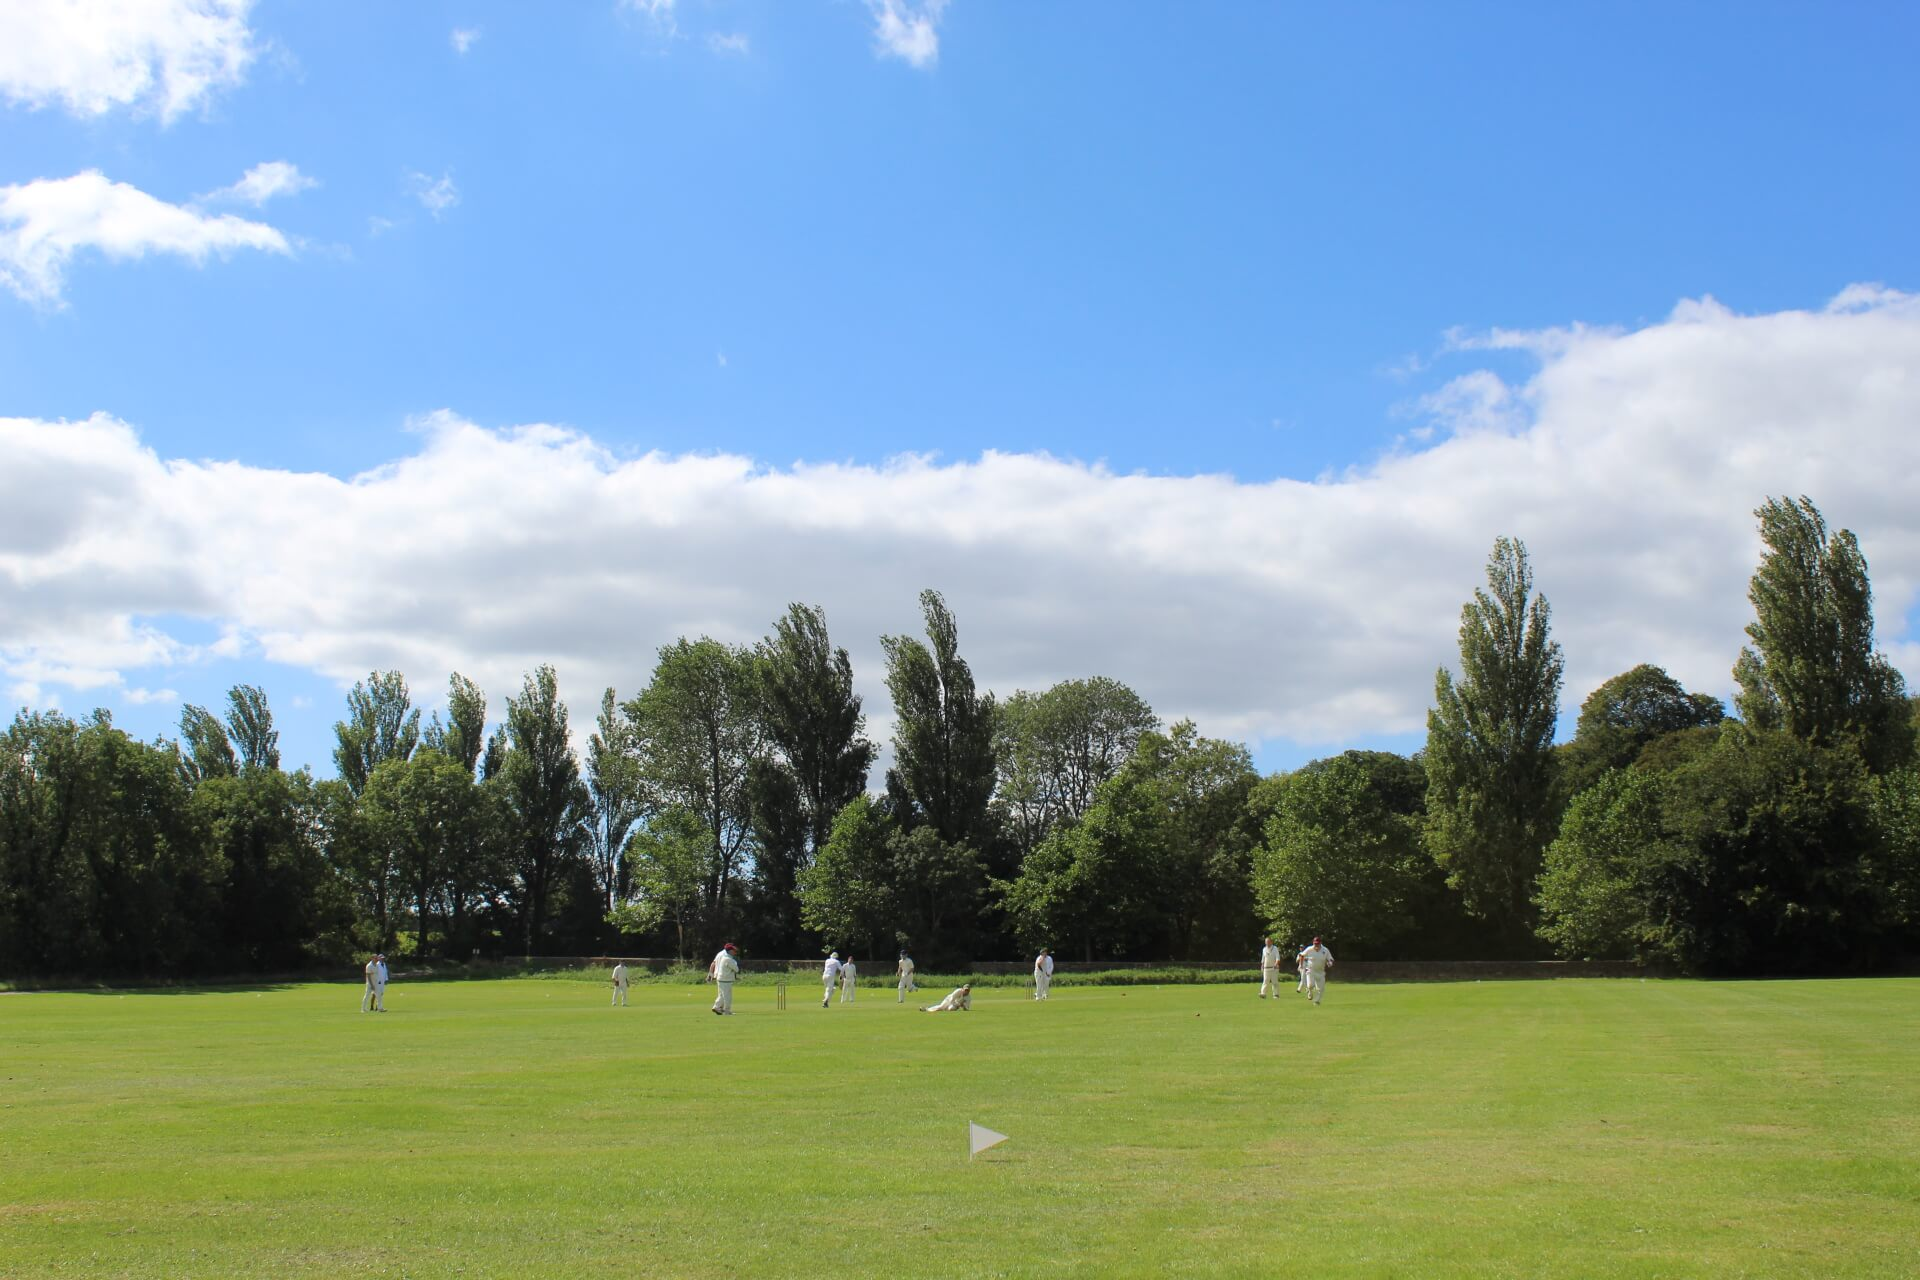 Cricket at Didmarton Village Hall